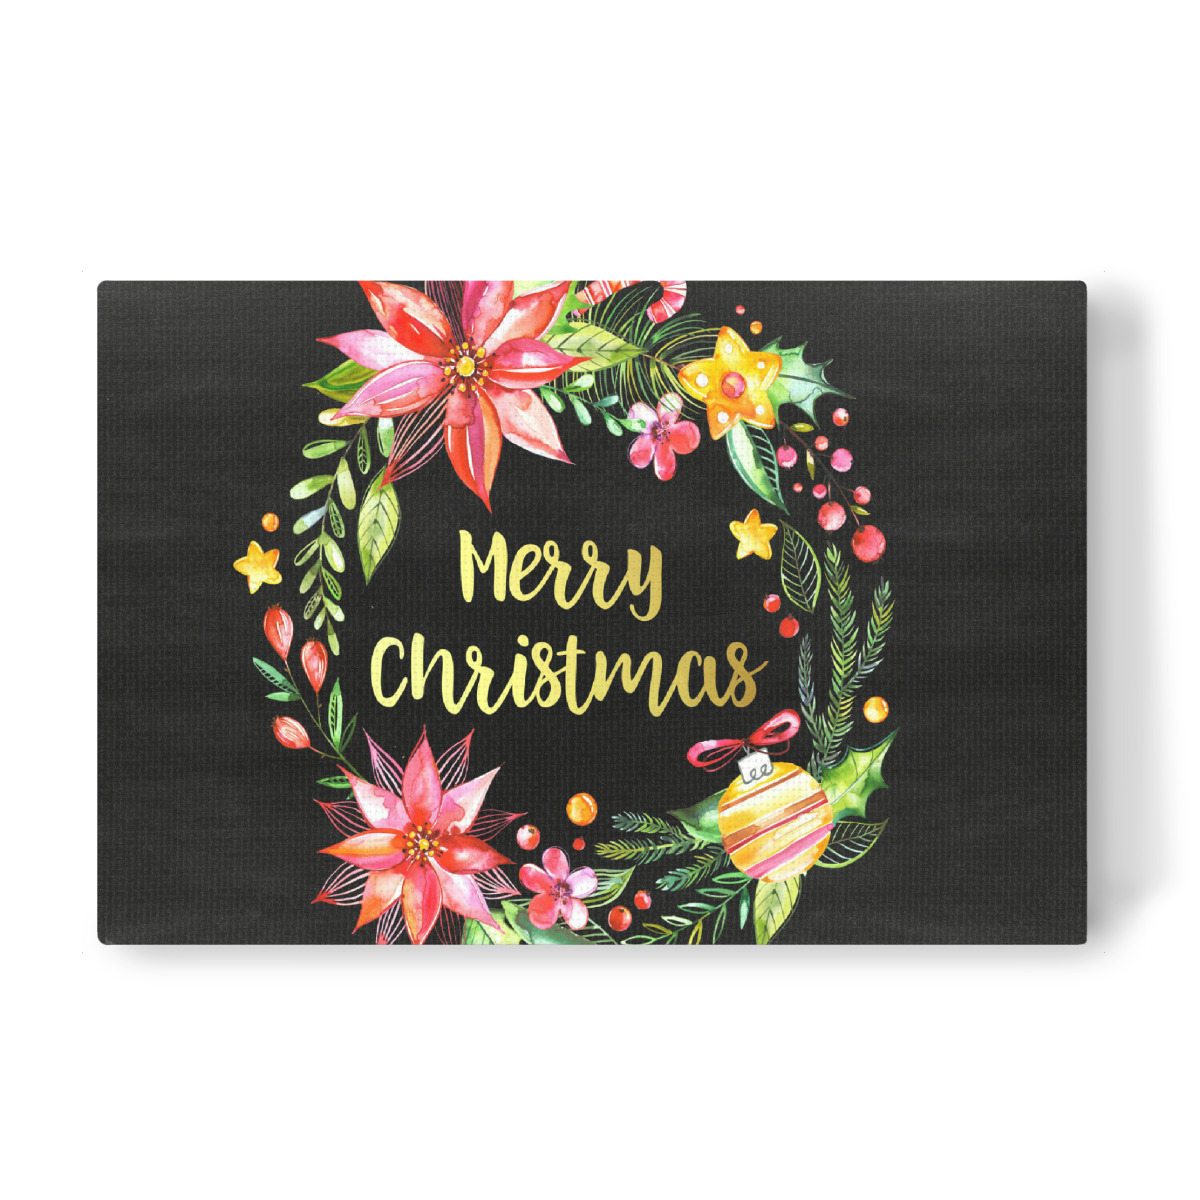 Merry Christmas Chalkboard Landscape als Leinwand bei artboxONE kaufen